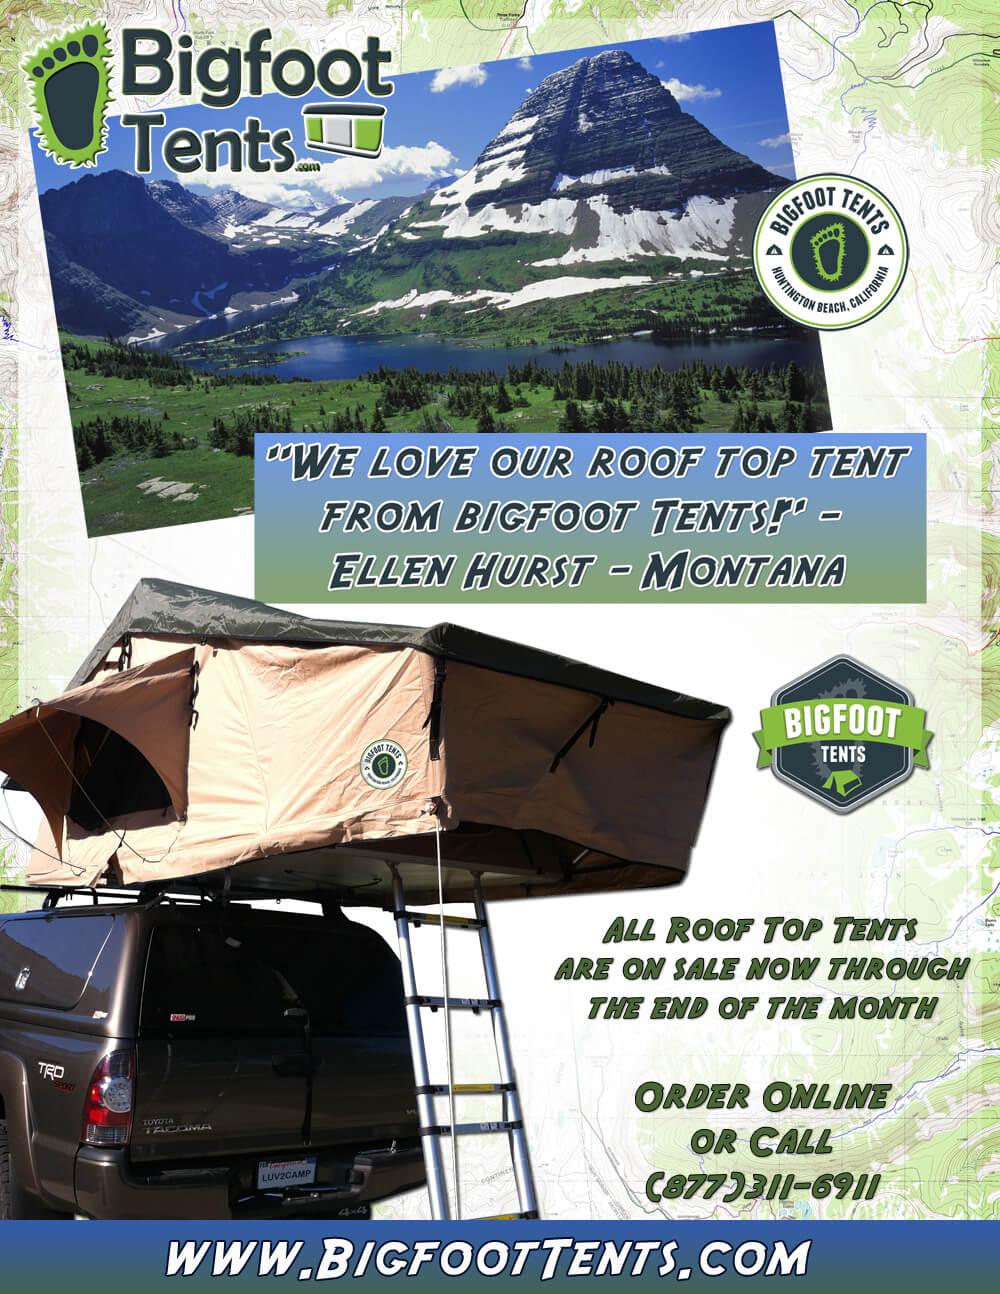 explorer series hard shell roof top tent blk grn. Black Bedroom Furniture Sets. Home Design Ideas